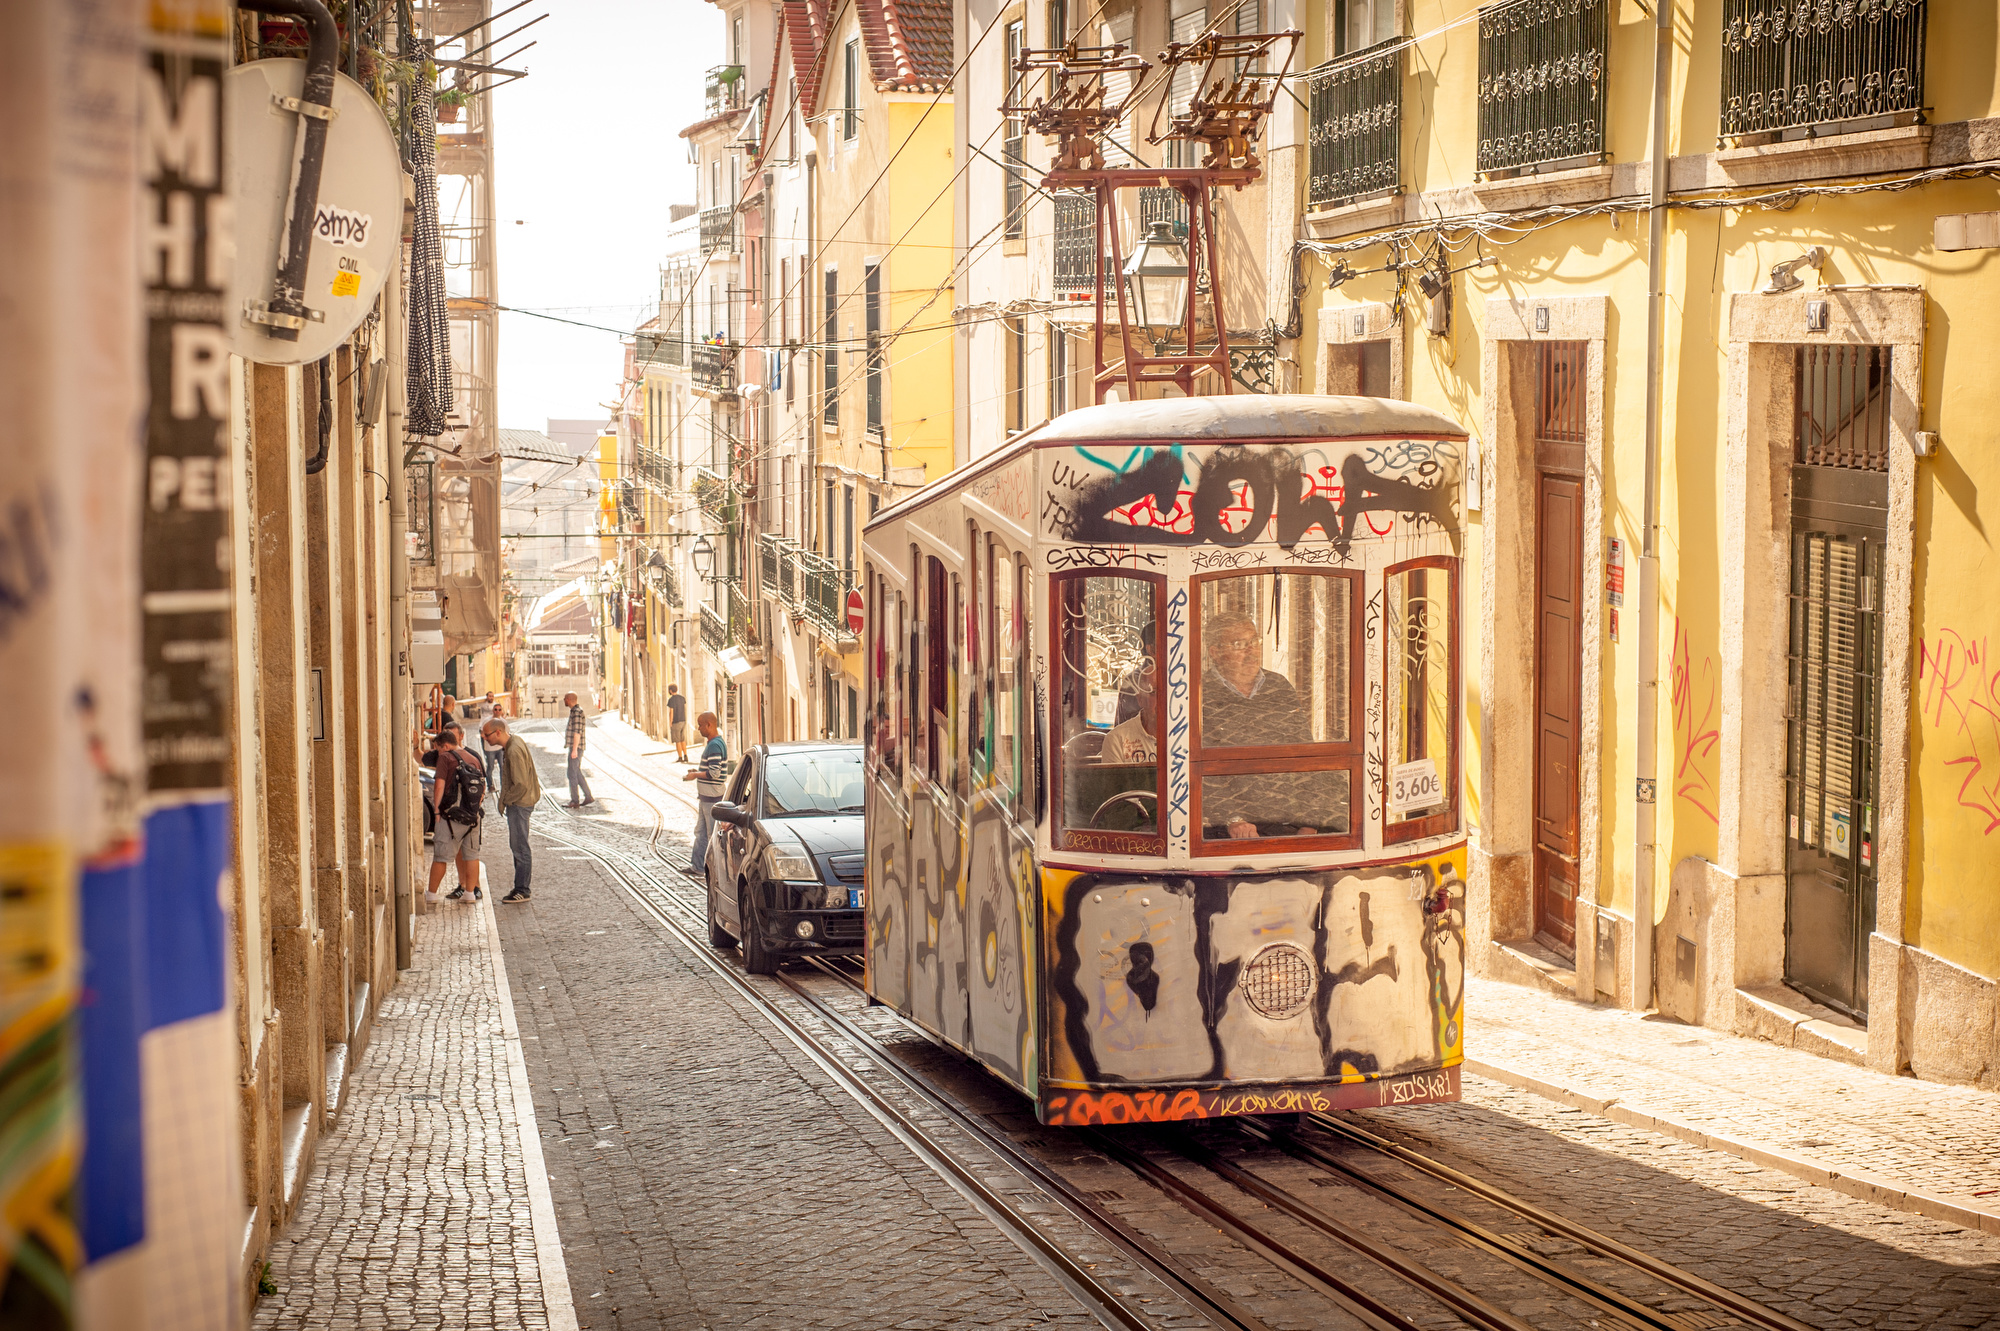 File:Lisbon 2015 (23210620275).jpg - Wikimedia Commons